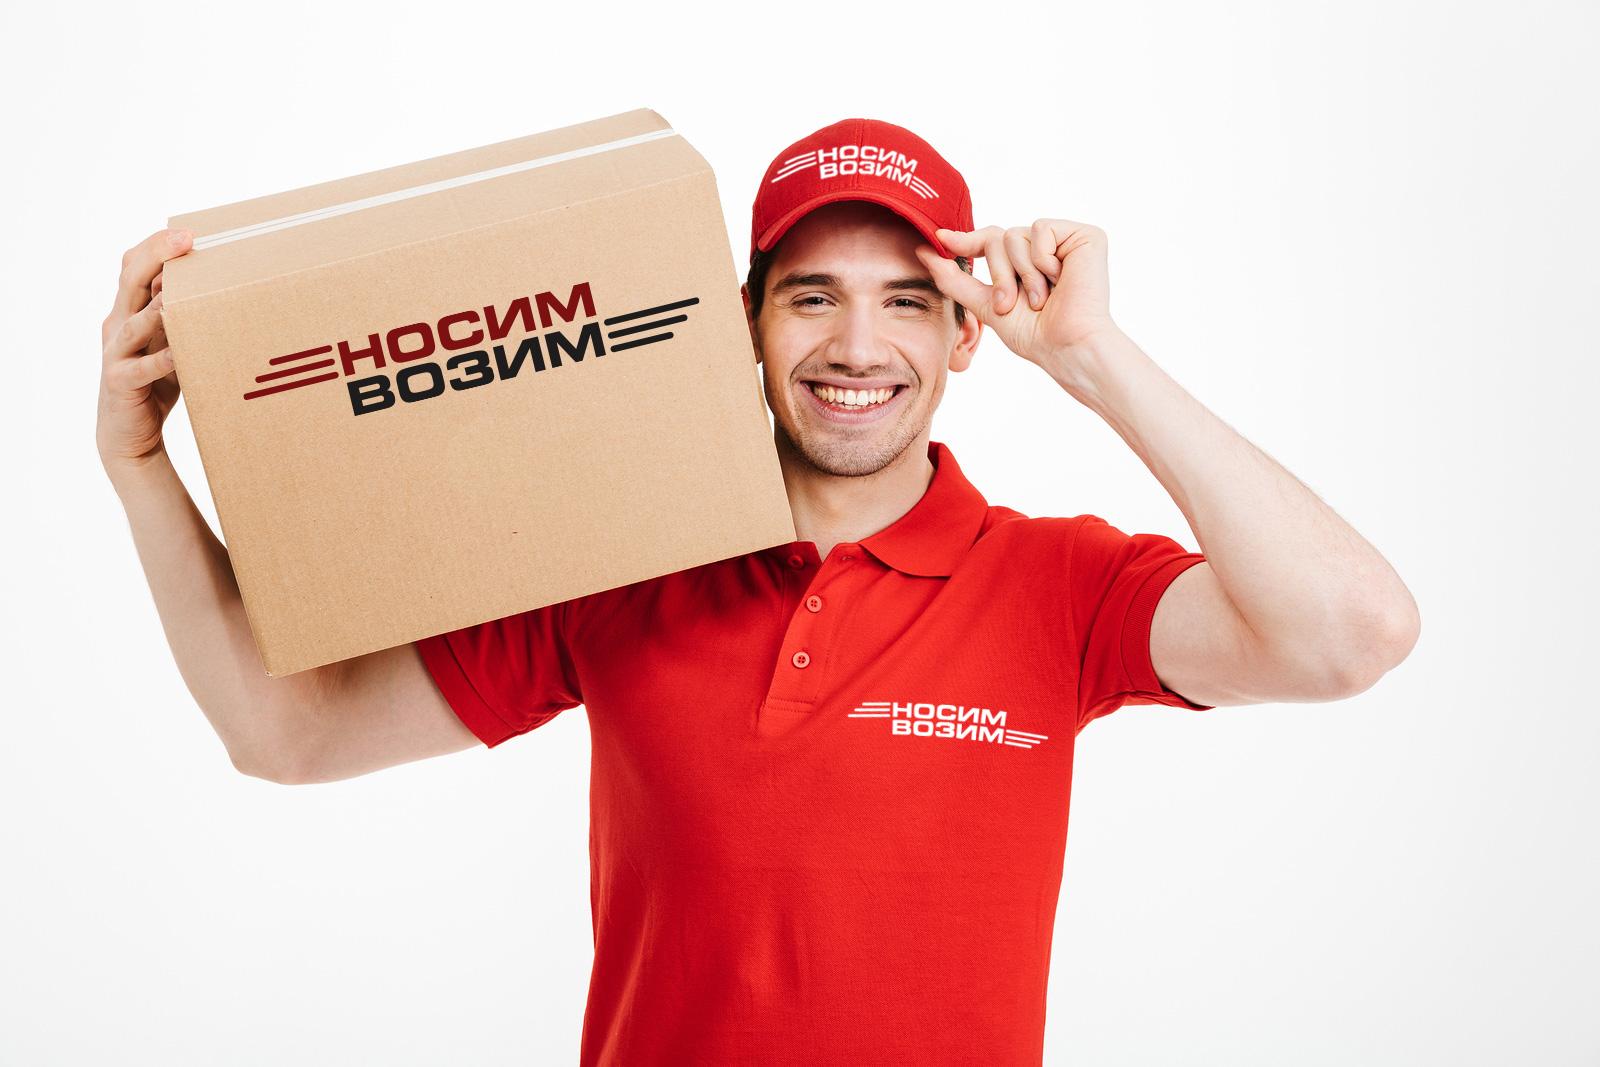 Логотип компании по перевозкам НосимВозим фото f_1015cf82550a3dd3.jpg